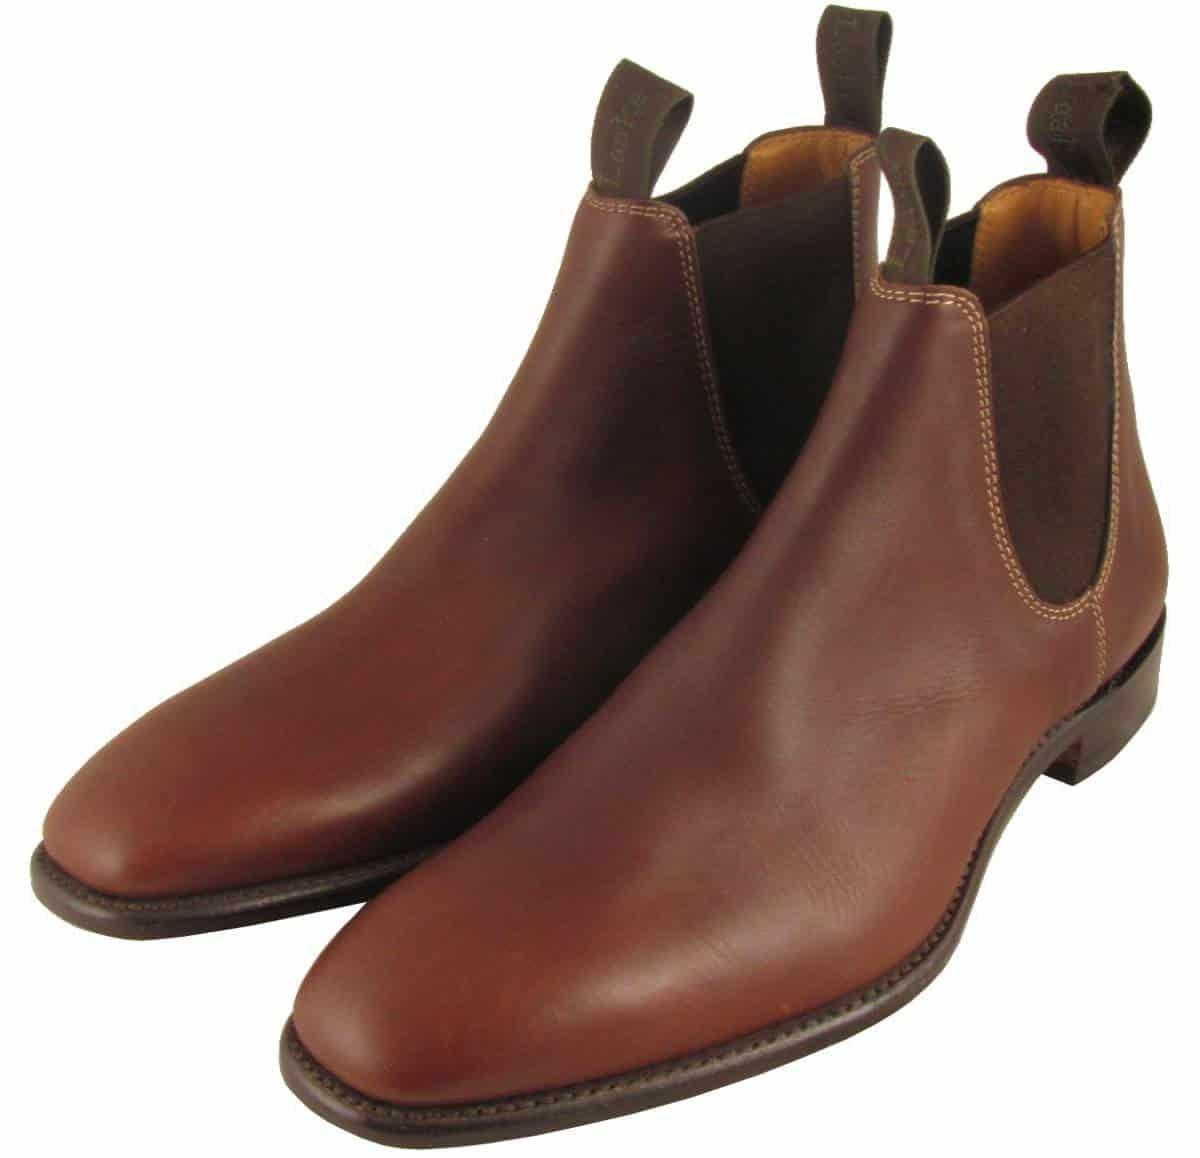 Fashion Men/'s Leather Chelsea Boots Cuban Heels Motor Ankle Boots Blacki British